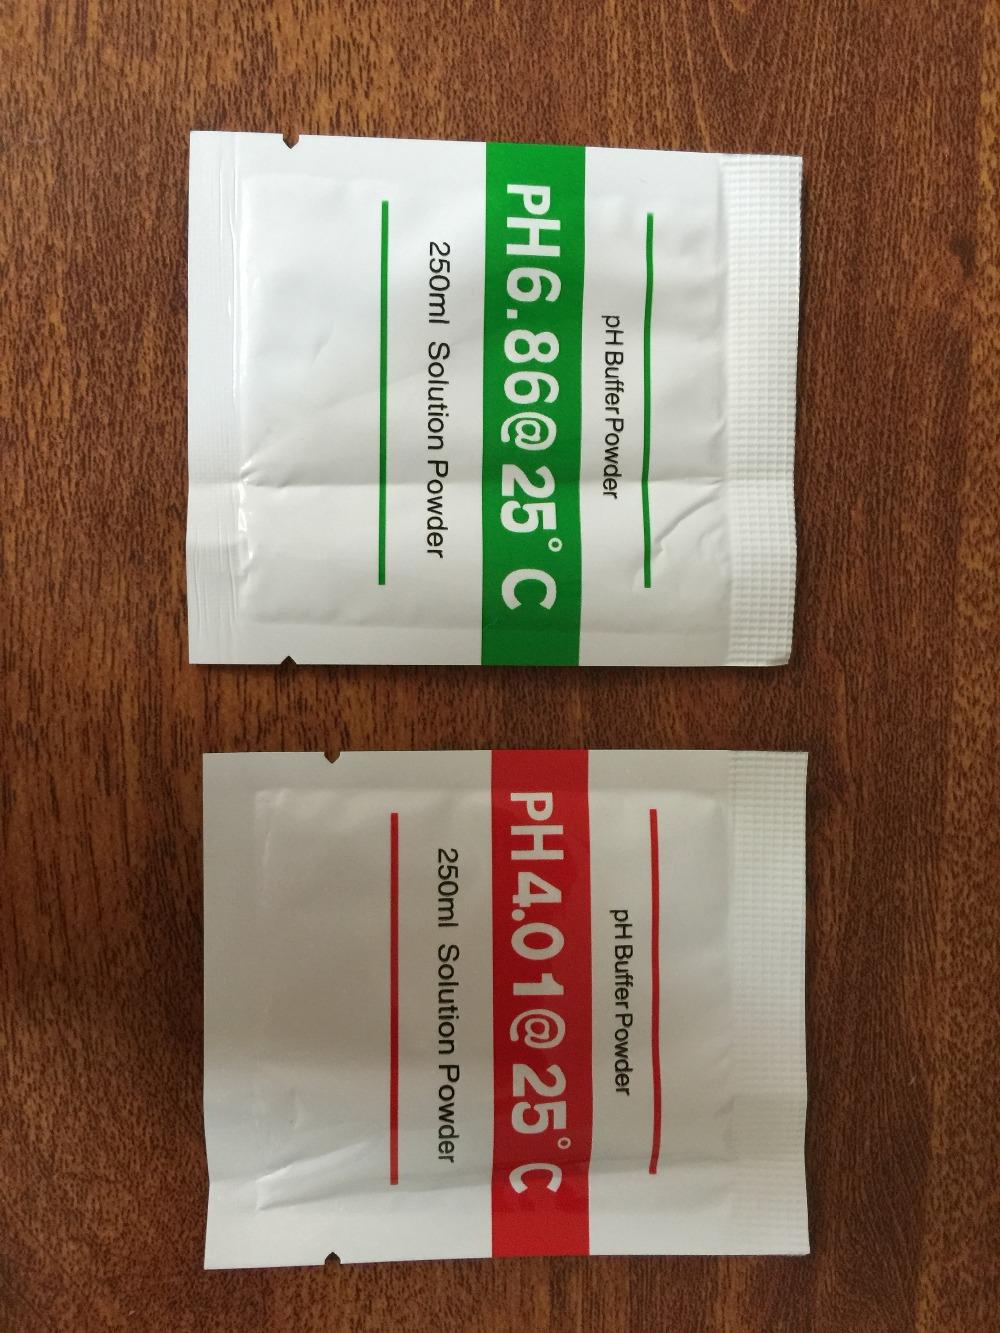 2pcs PH Buffer Powder for PH Test Meter Measure Calibration Solution 4.01 6.86pH